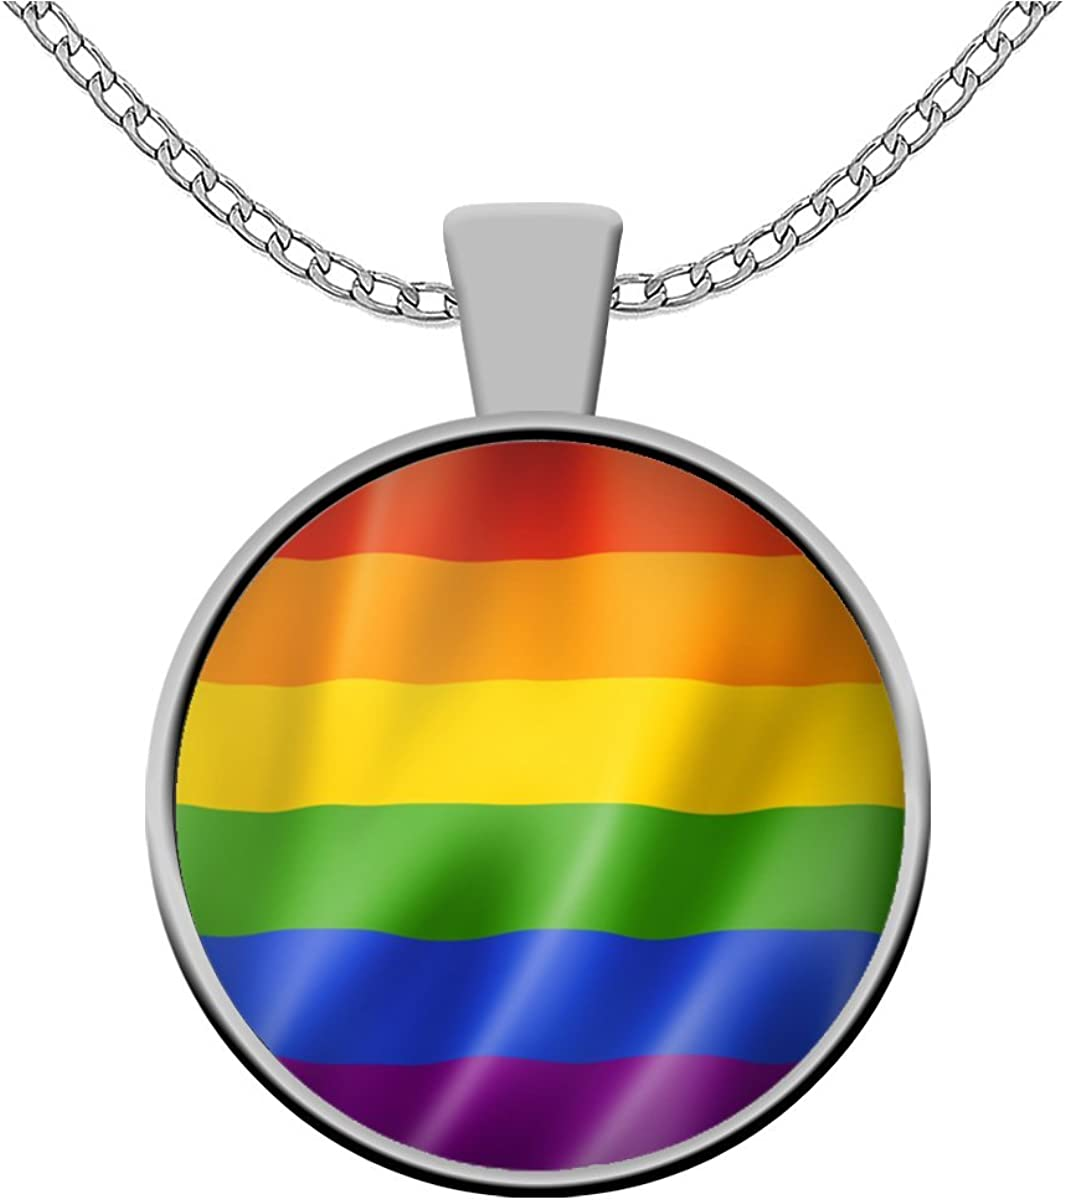 LGBTQIA Neon necklace Pride accessory LGBT Festival necklace Ally Rainbow flag Pride flag Rainbow necklace Pride necklace Gay flag